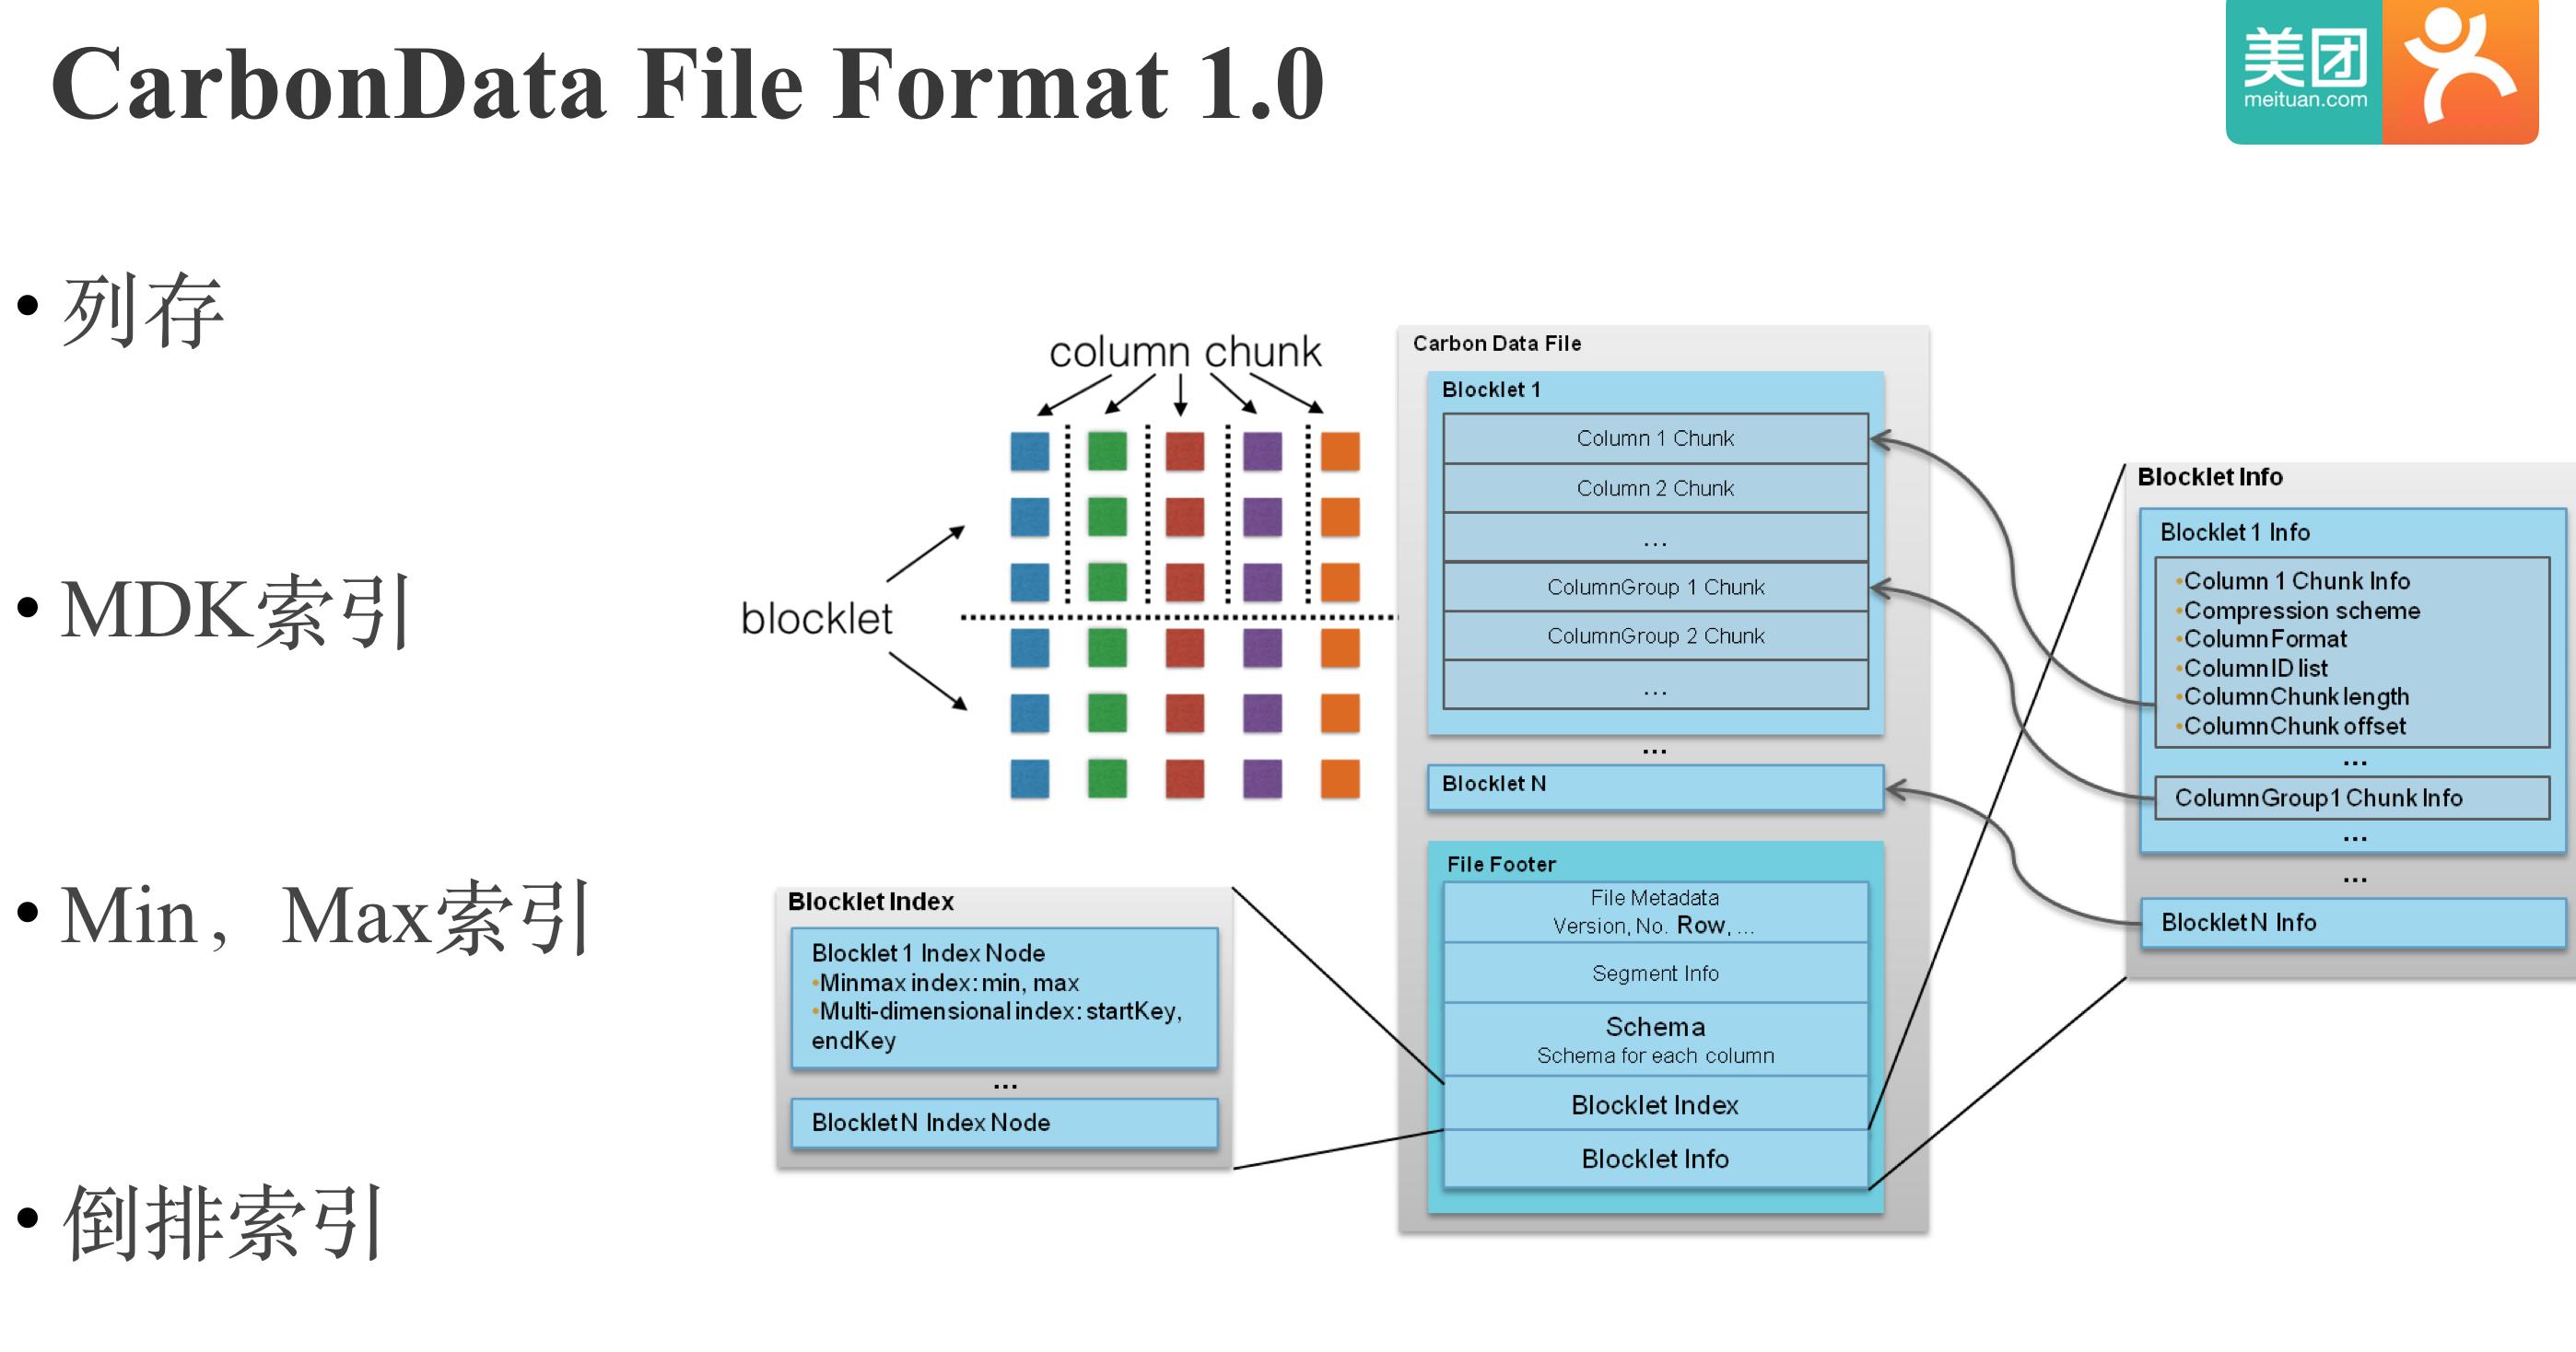 CarbonData File Format